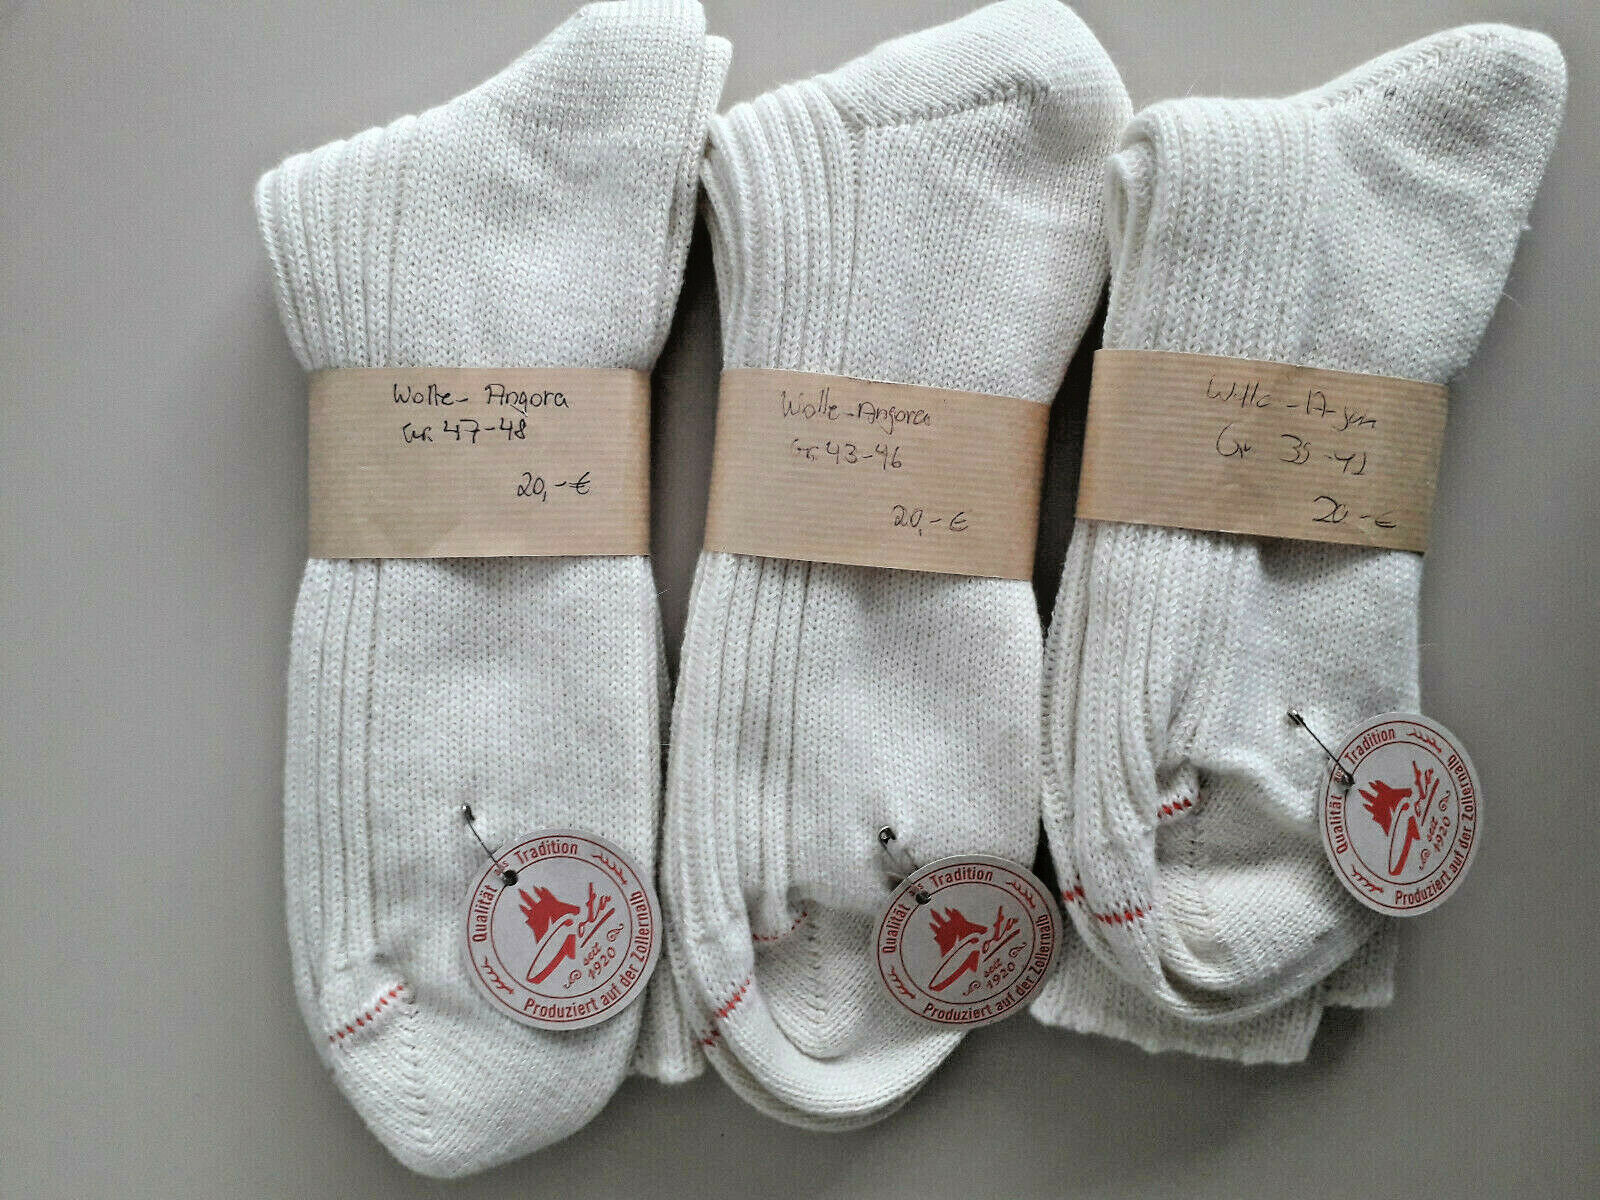 Socken aus Angora - Wolle (Merinowolle) - Baumwolle